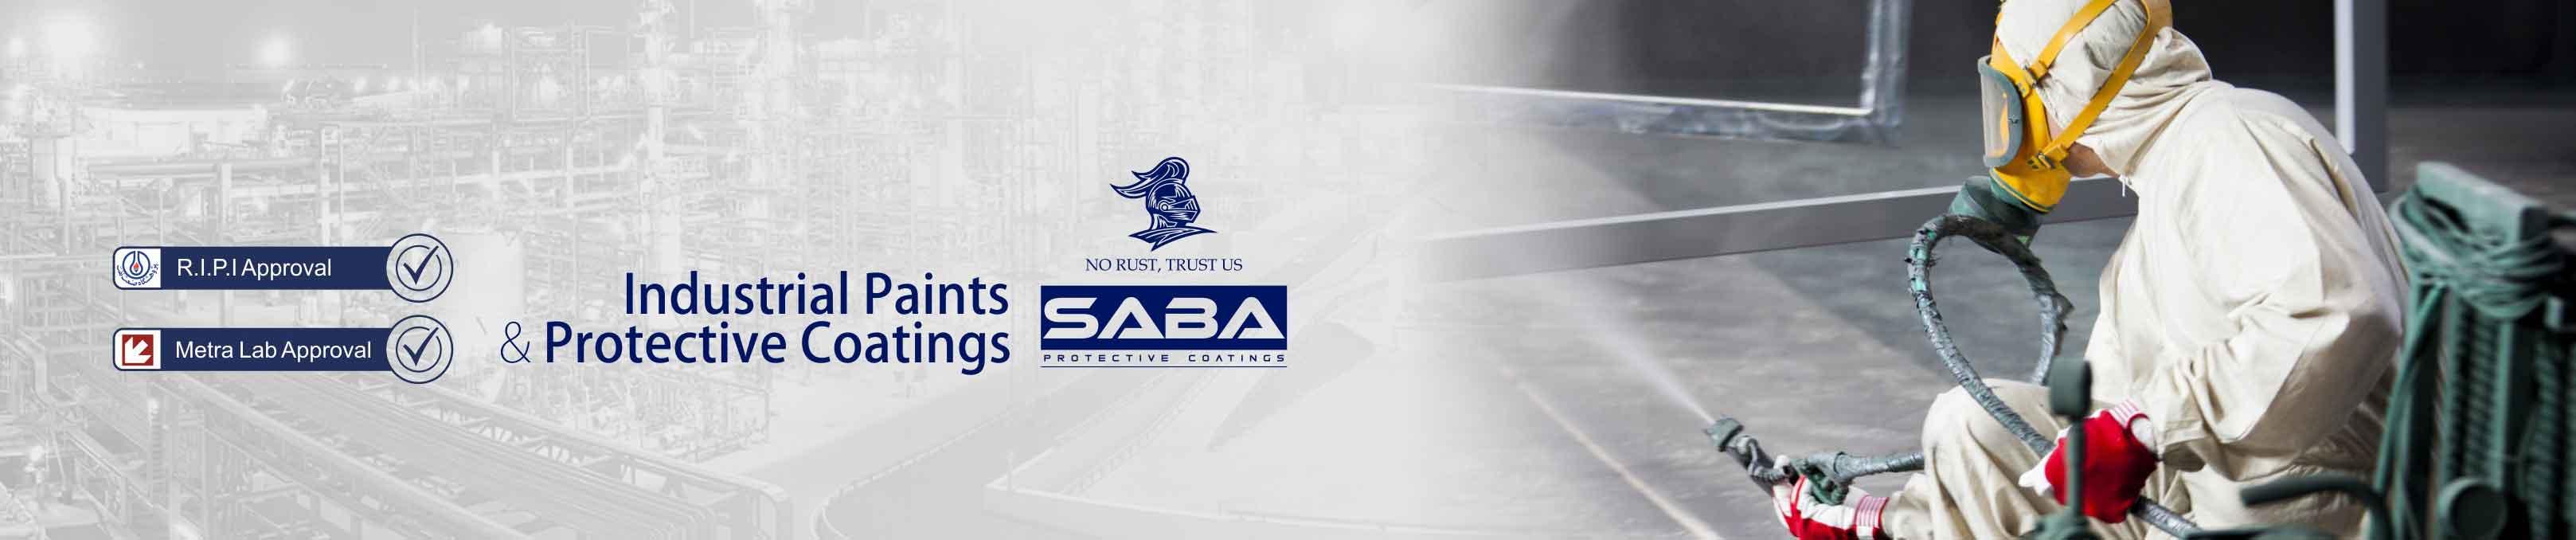 Saba-Slim-Slider-1-English web